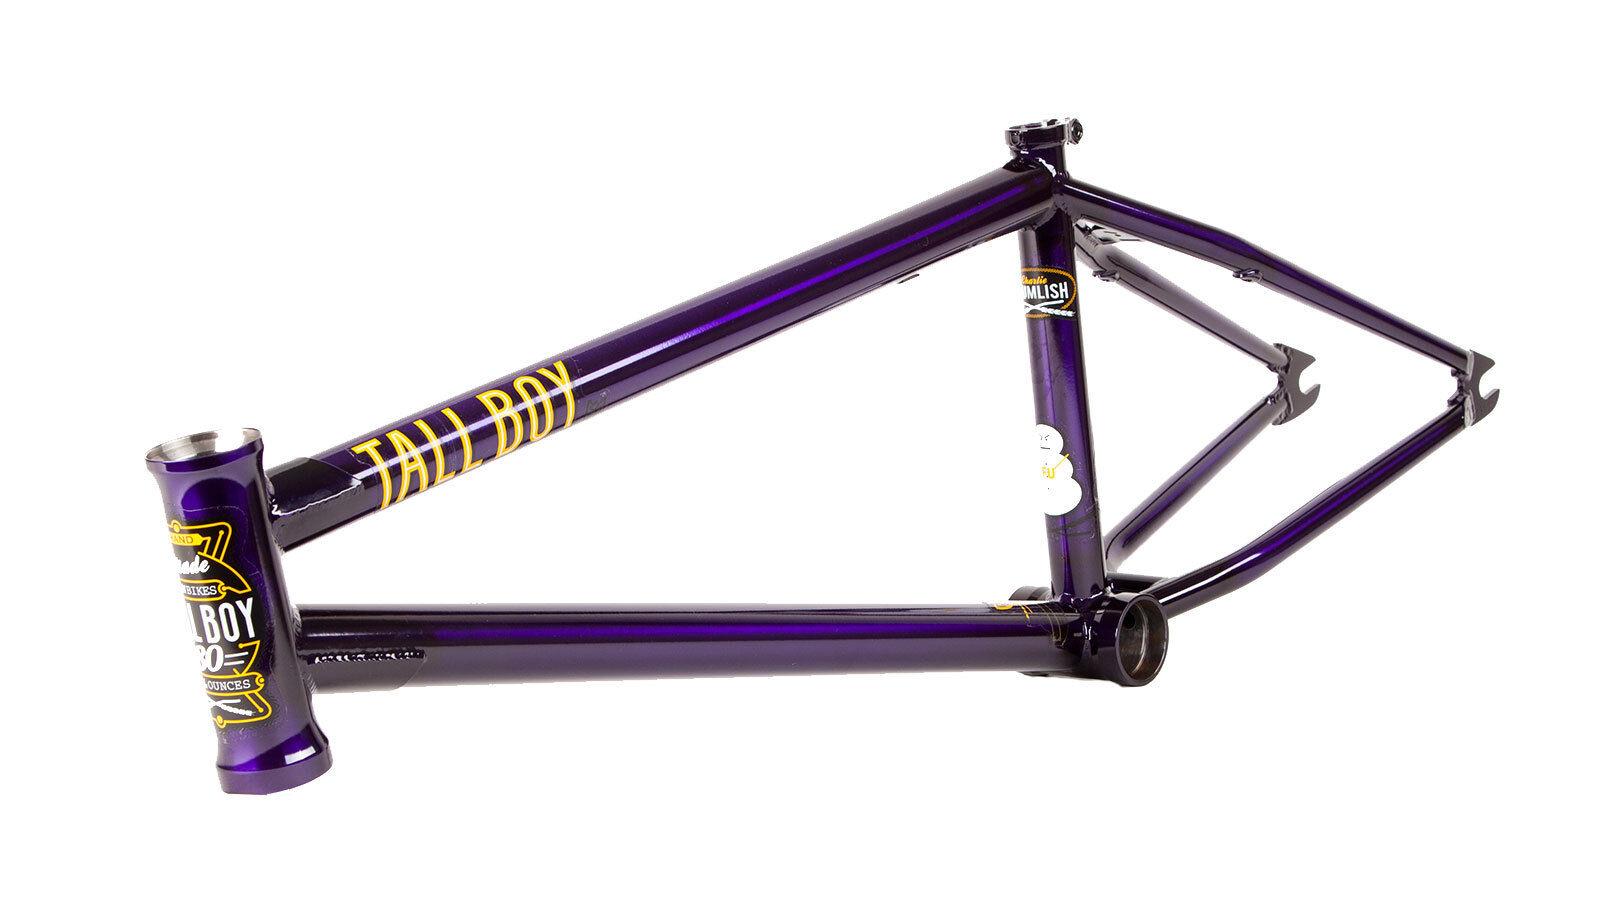 S&M BIKES TALL BOY FRAME TRANS PURPLE 21 CHARLIE CRUMLISH BMX BIKE FUBMX 21